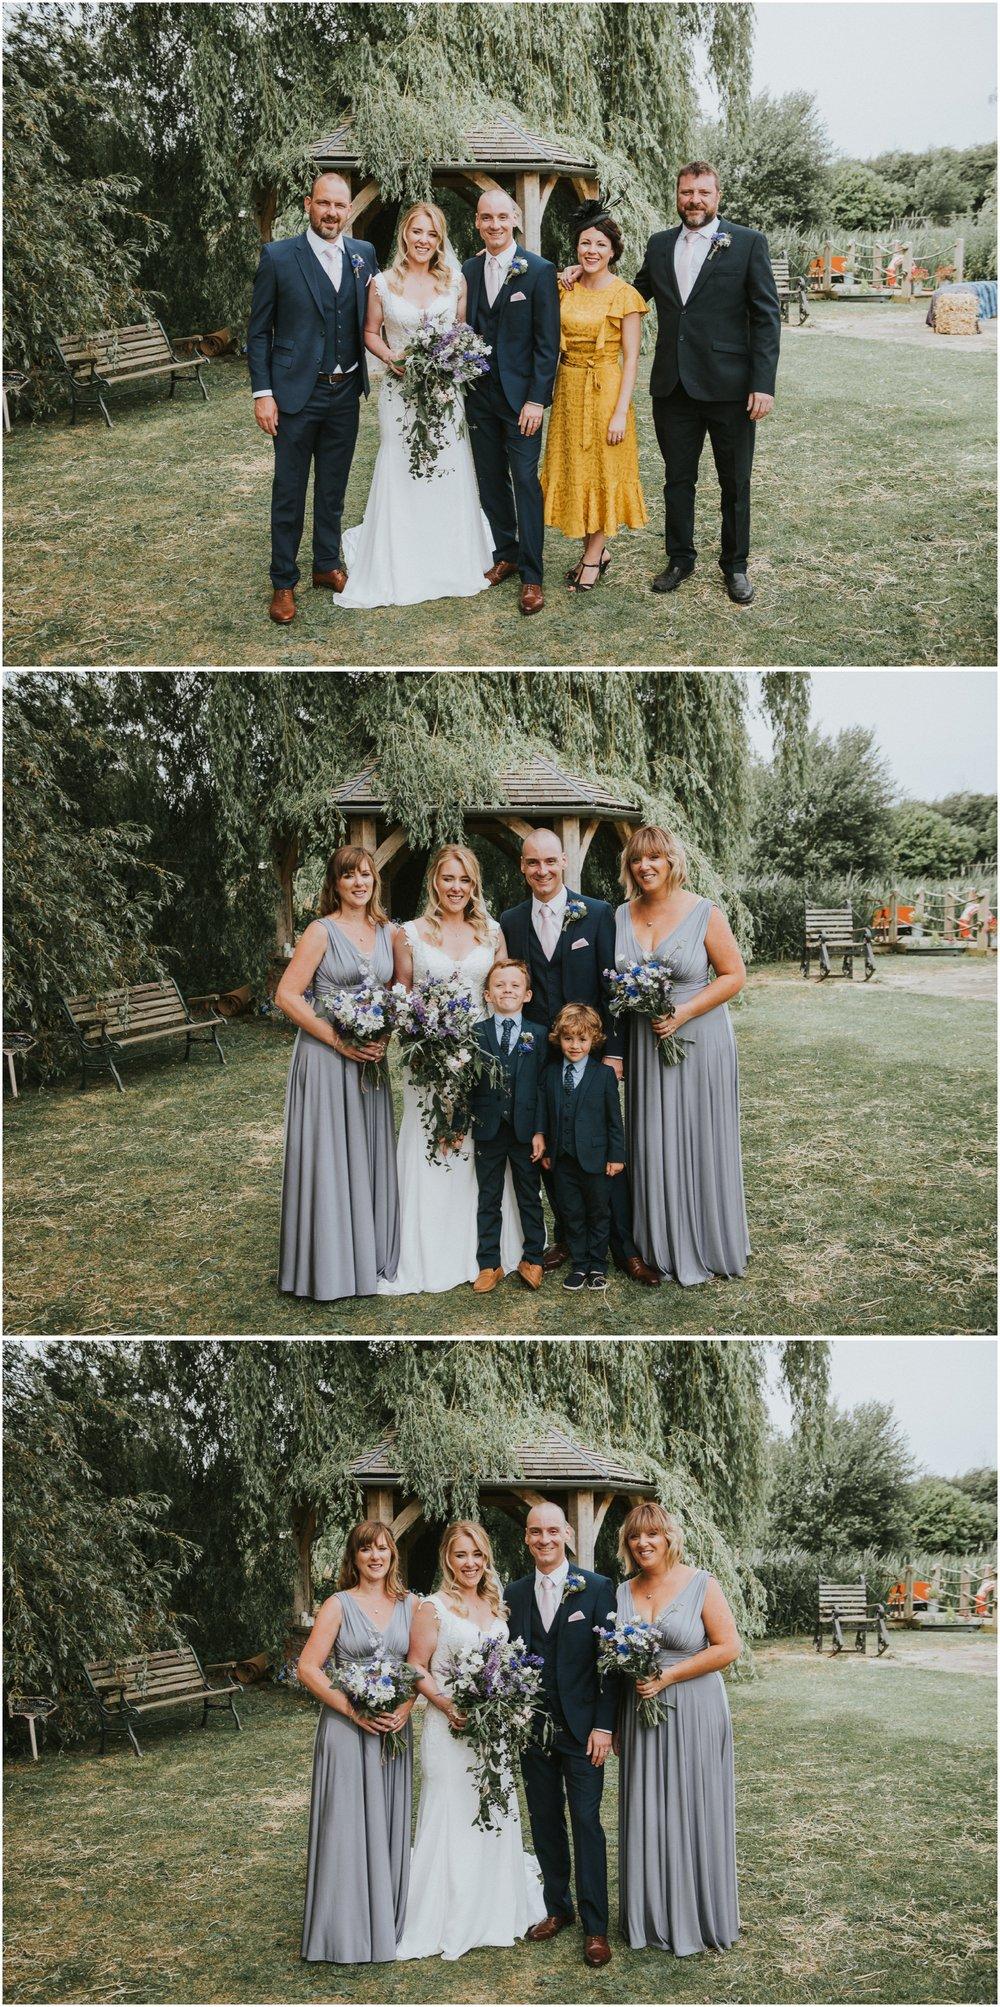 SkipbridegFarmWedding-LukeHolroyd-Yorkshirewedding_0056.jpg